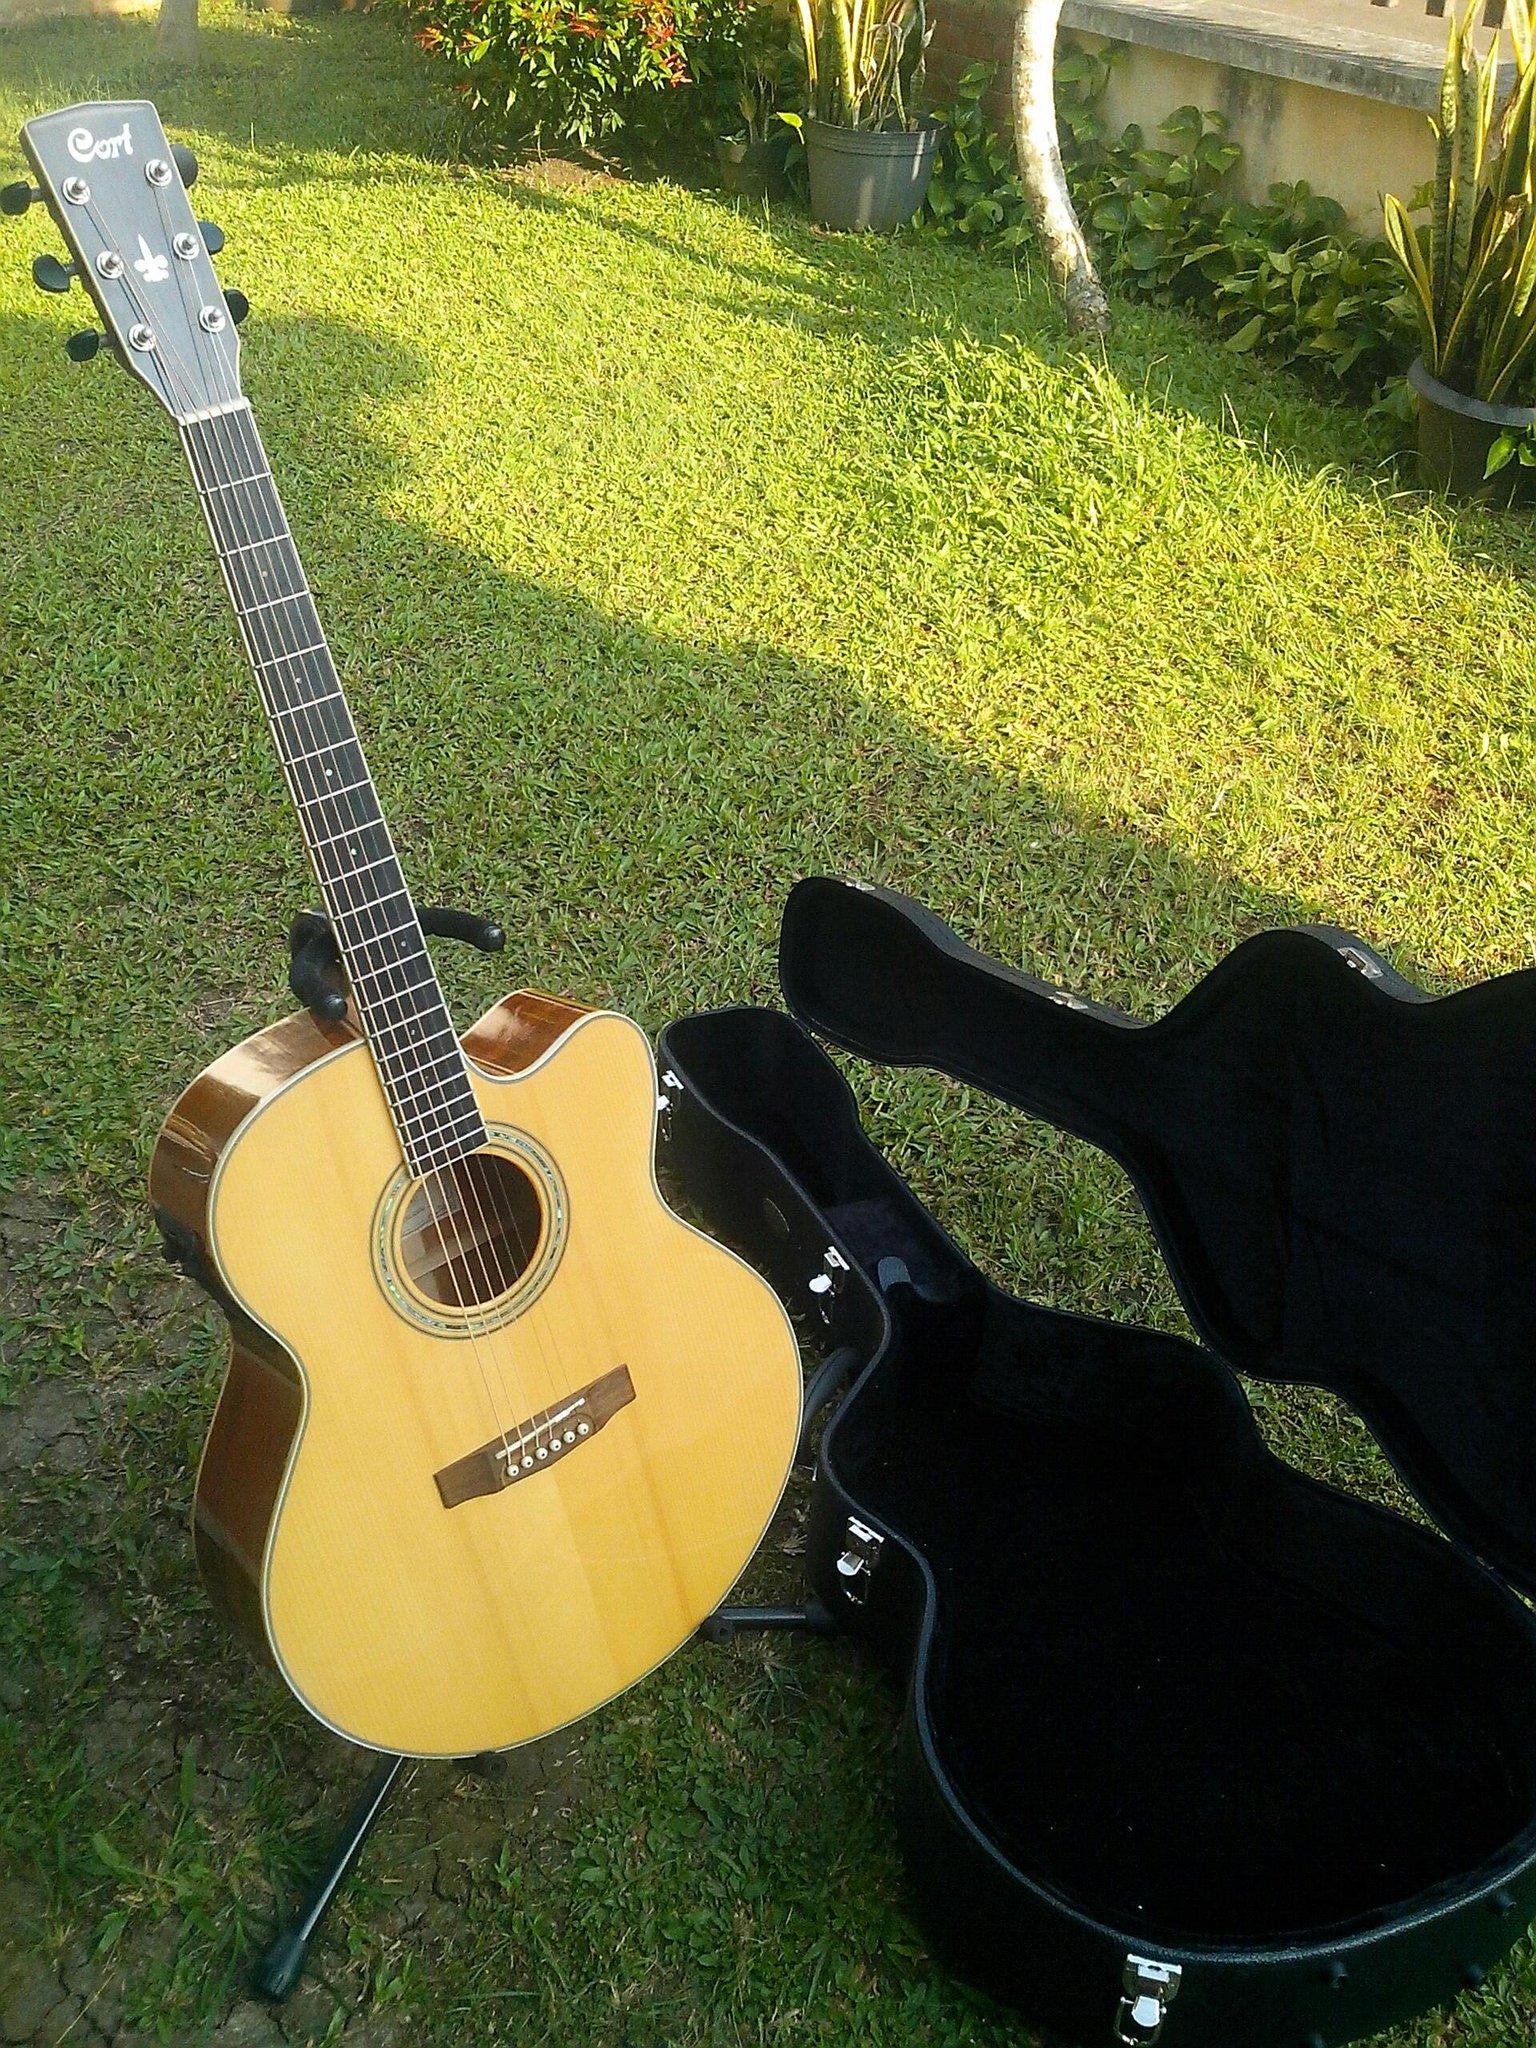 dijual gitar akustik-elektrik CORT CJ5X NAT. Kondisi prima, bonus hardcase. Monggo.. :-) http://t.co/wdoLCa5spV